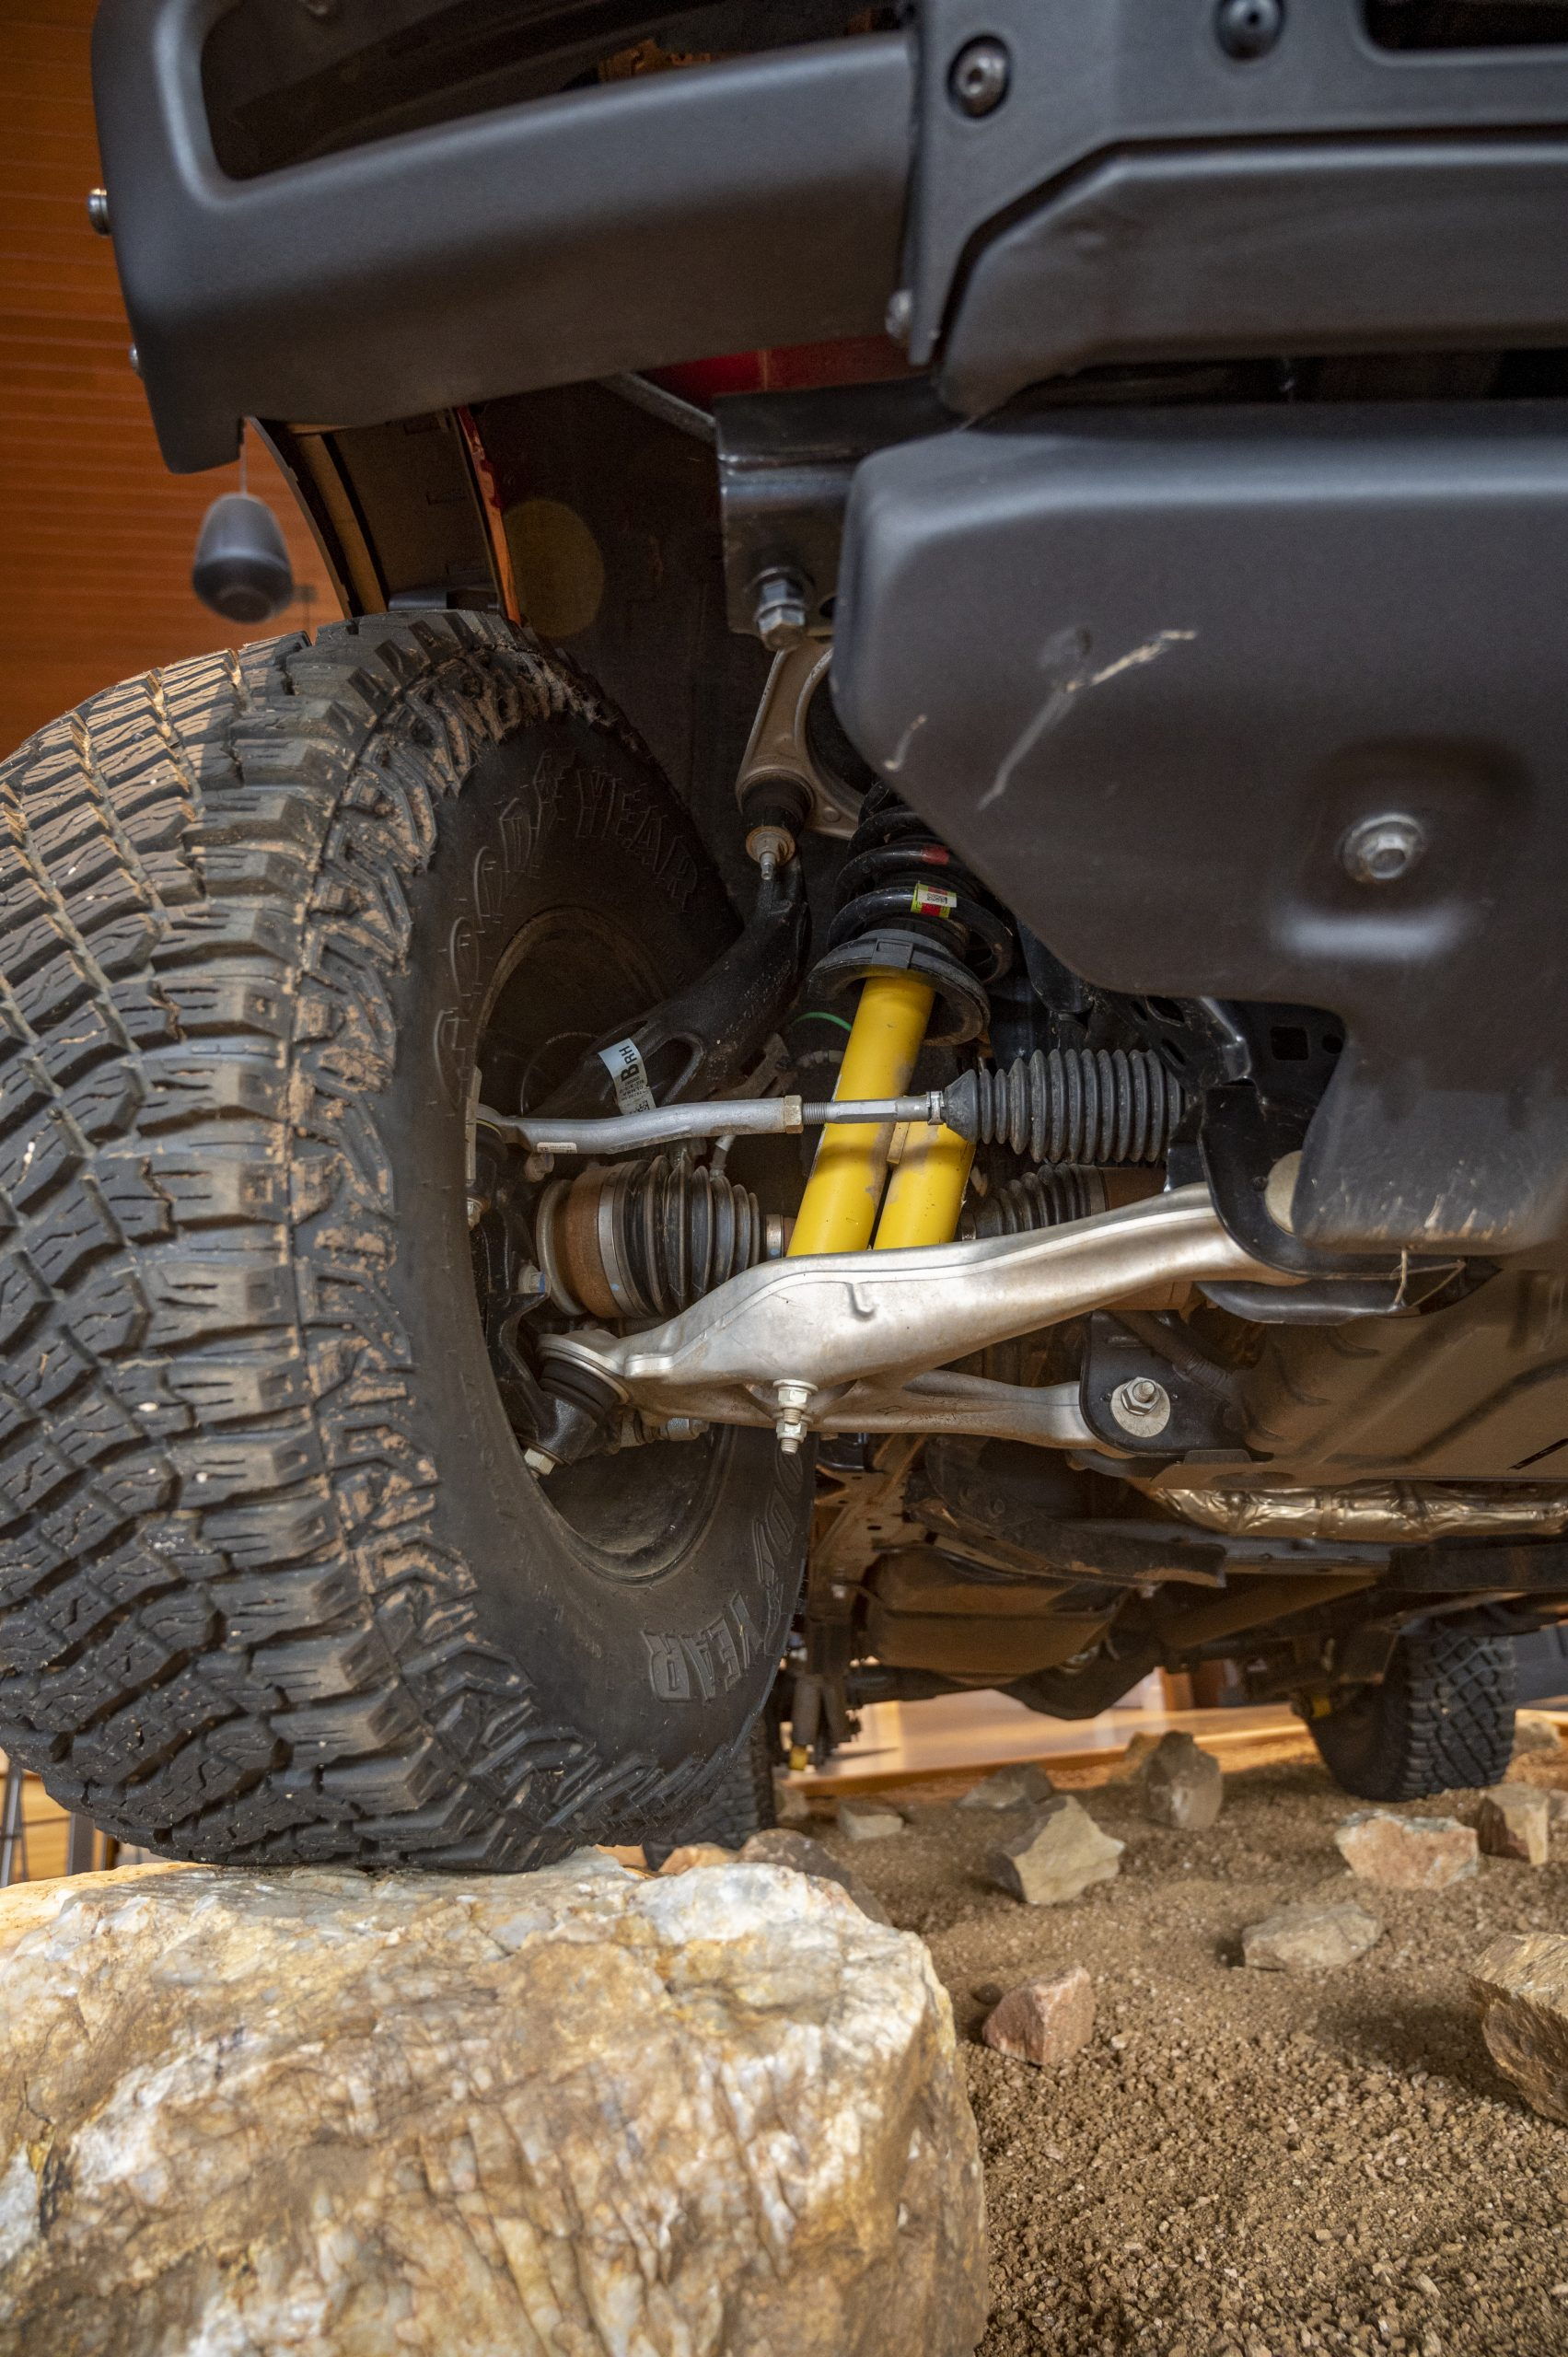 2021 Ford Bronco suspension geometry detail